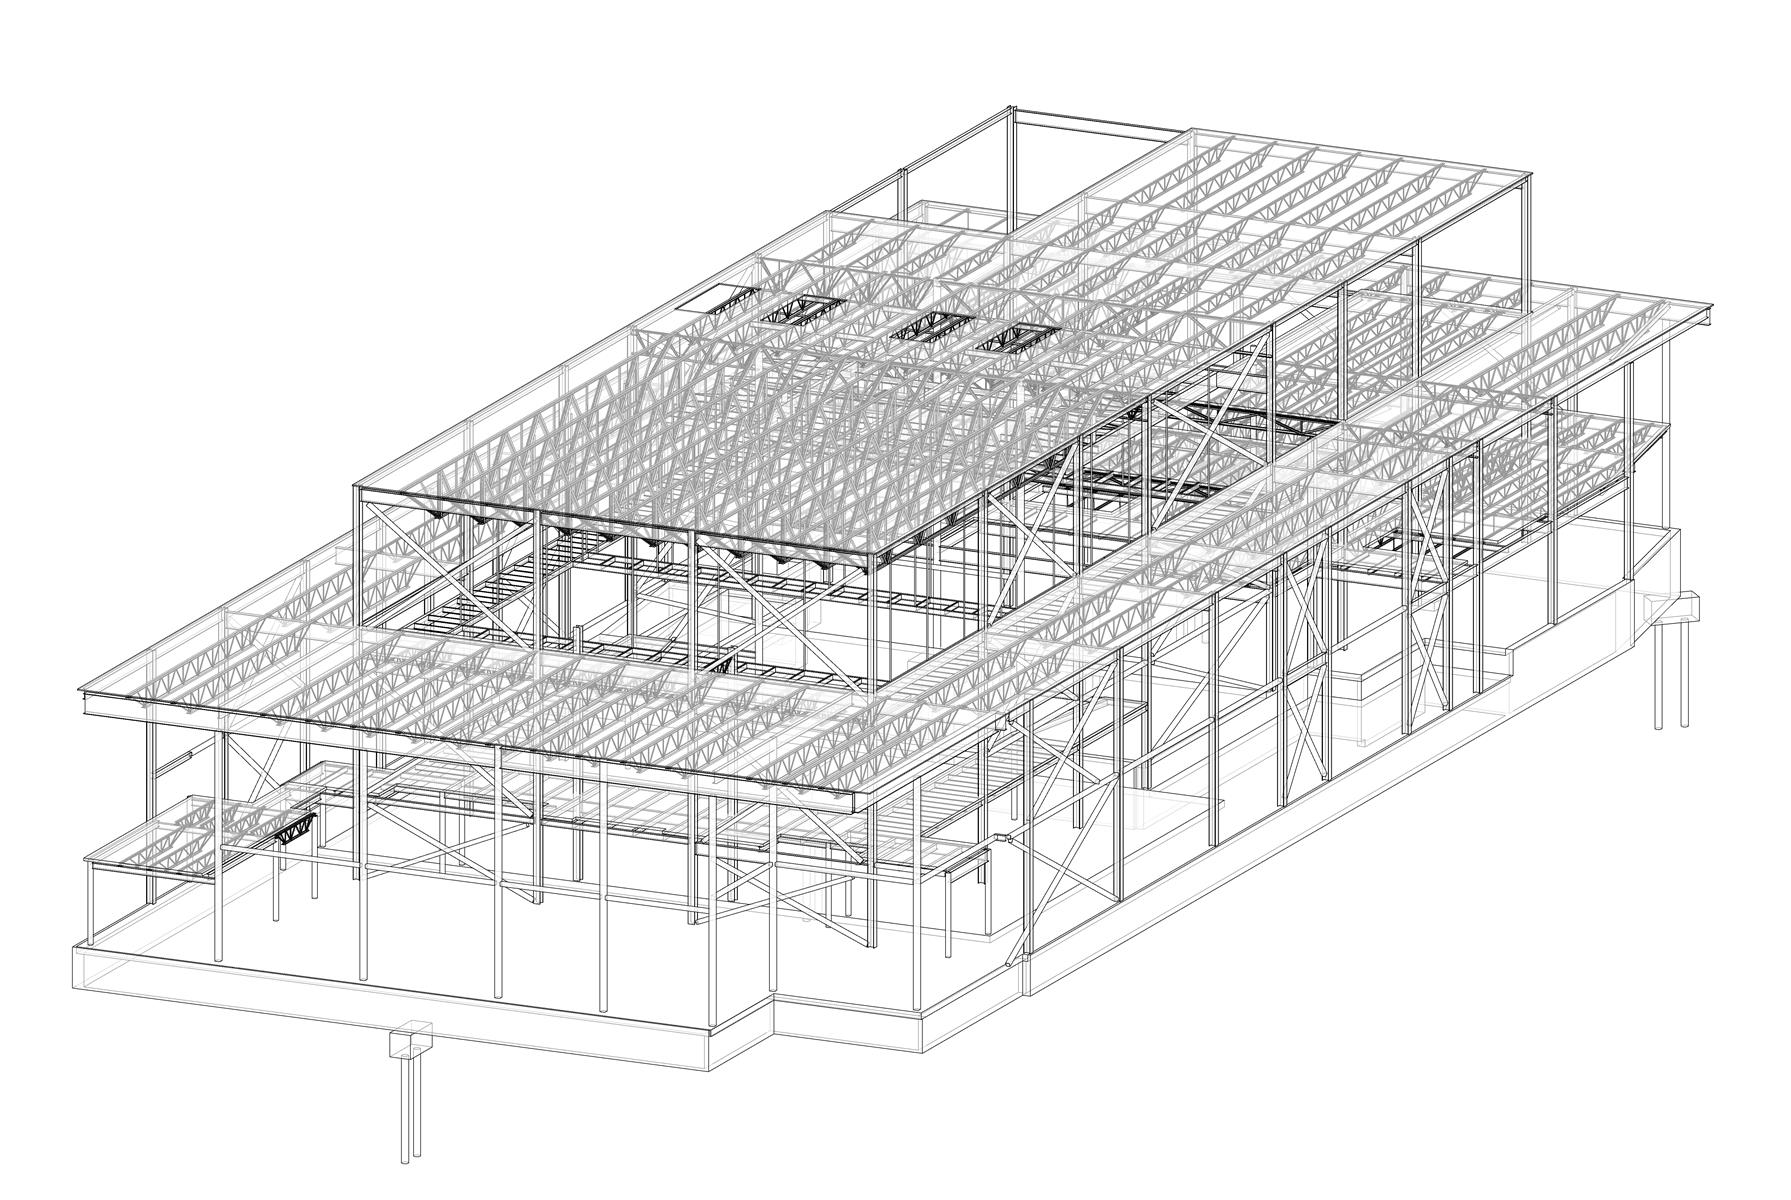 REPT-axo-structure_1791x1200.jpg